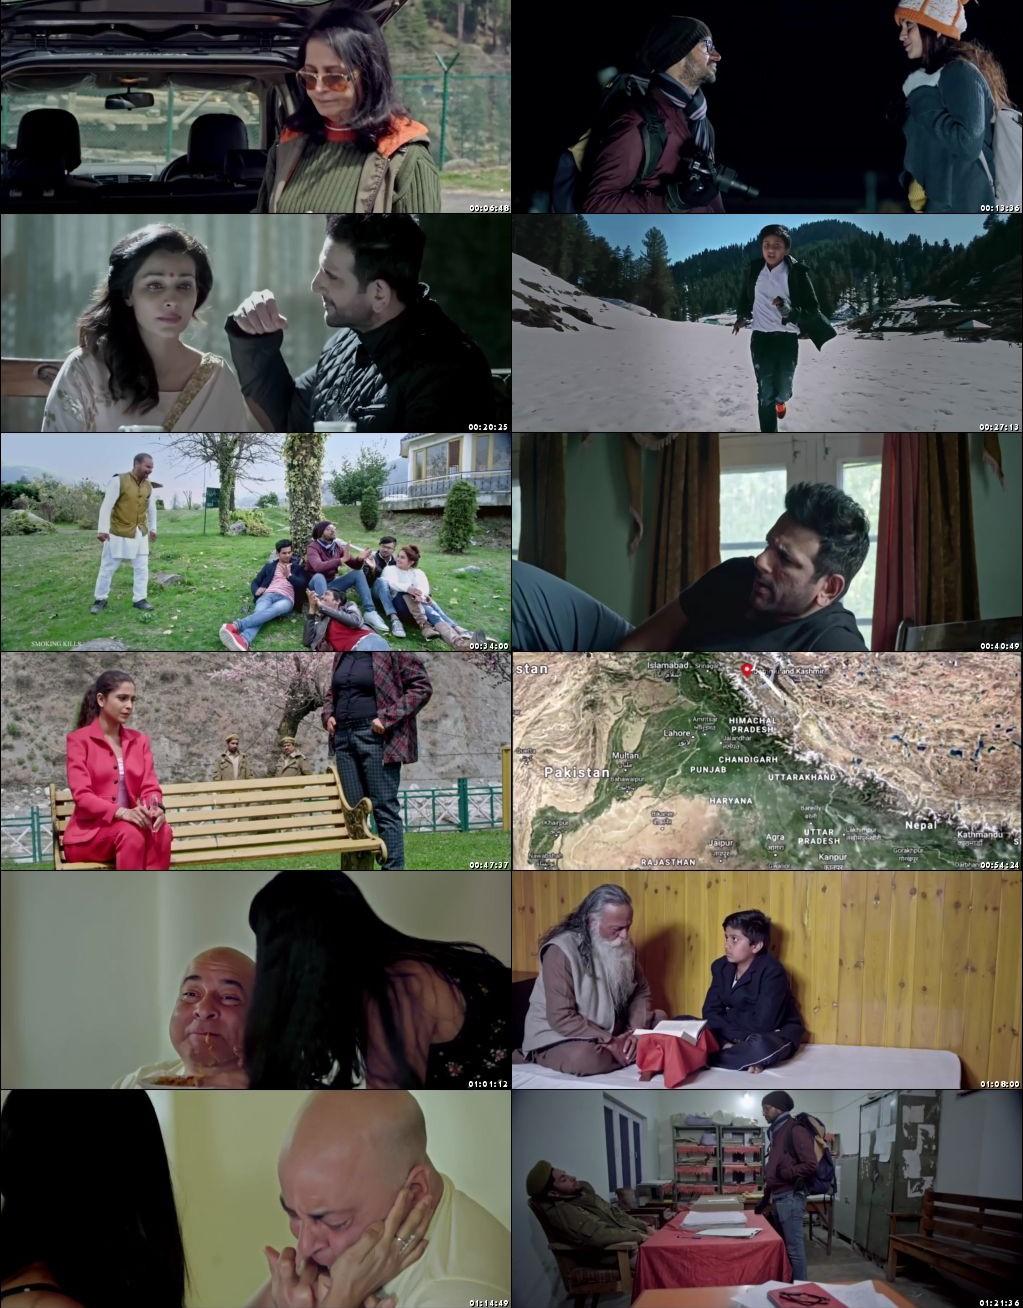 Regards & Peace 2020 Full Hindi Movie Online Watch